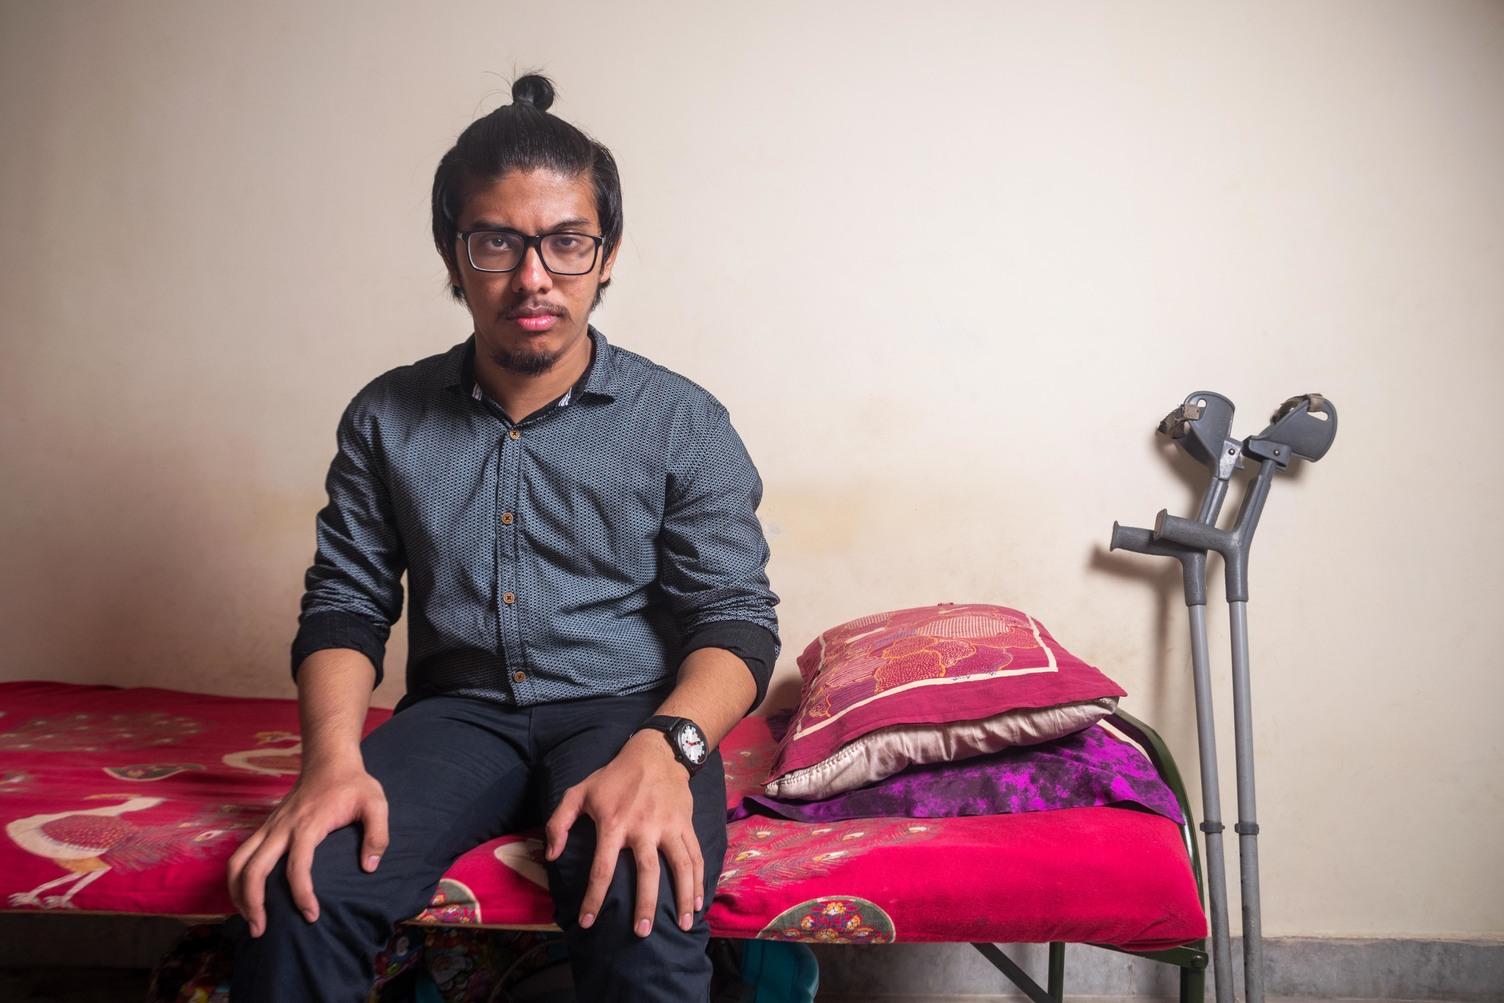 Adarsh Chetry studies at Motilal nehru College, Delhi University. Photographed at his residence in Satya Niketan